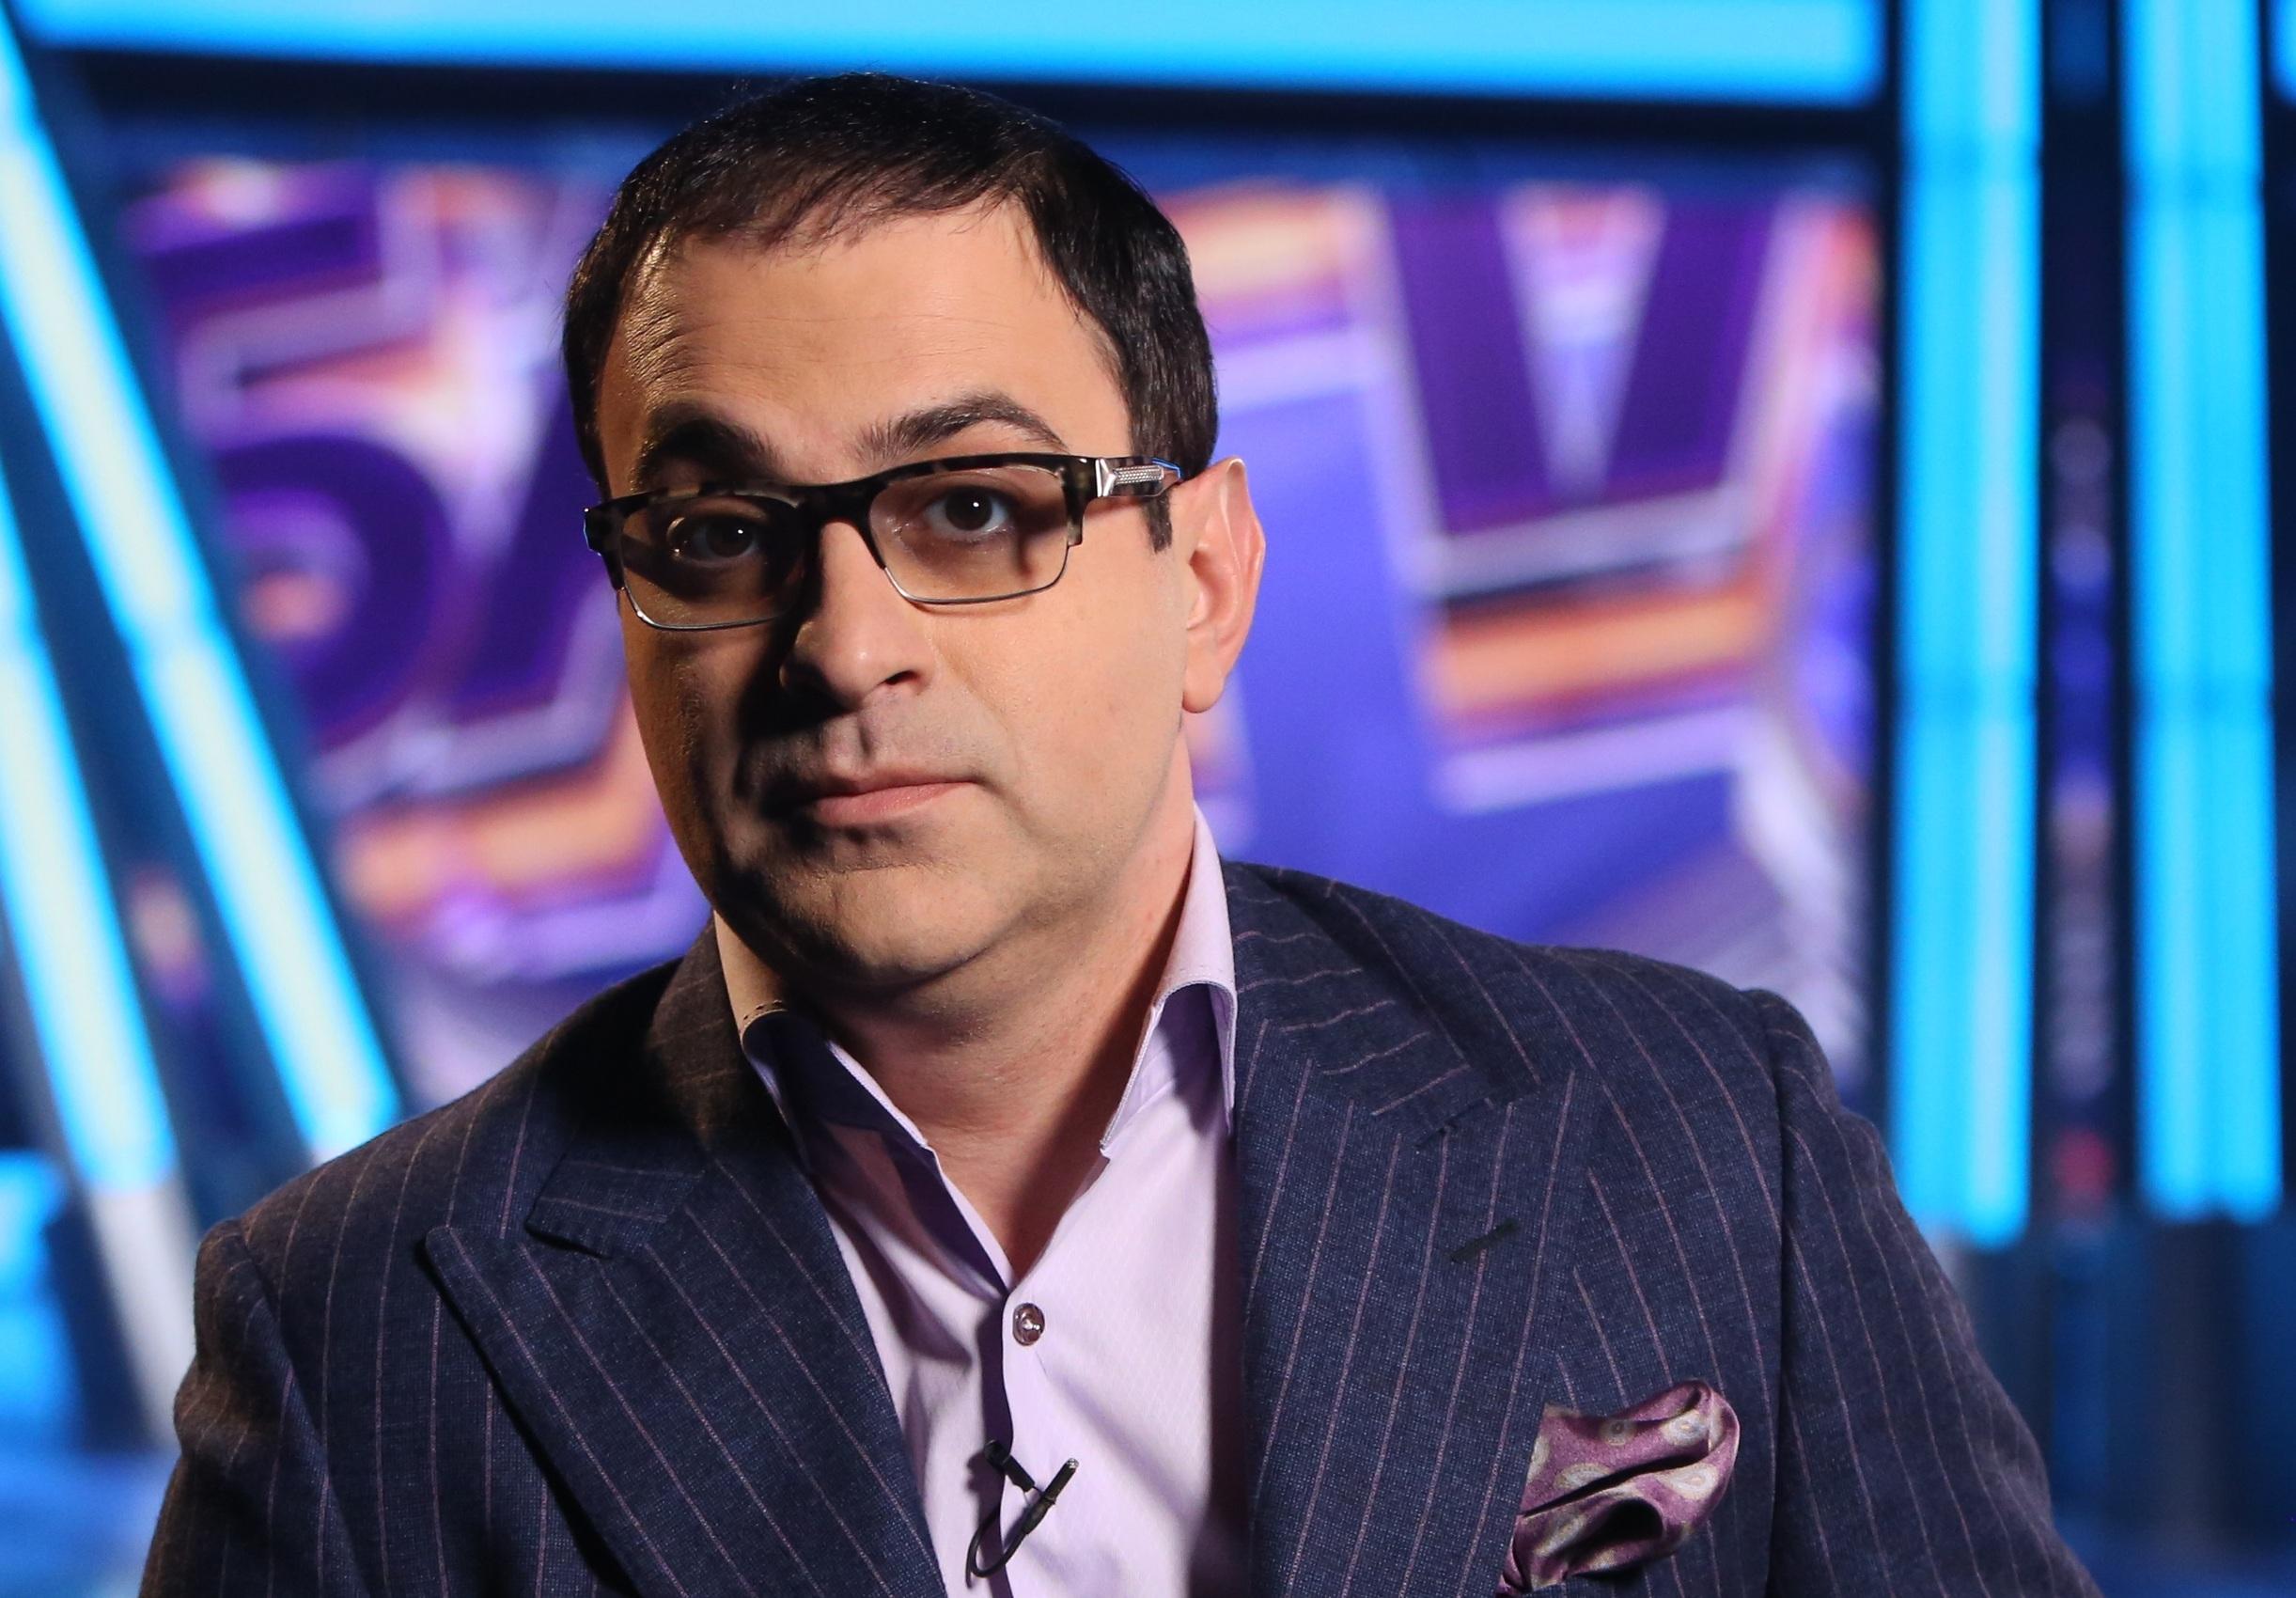 Garik Martirosyan spoke sharply about the situation with Idrak Mirzalizade